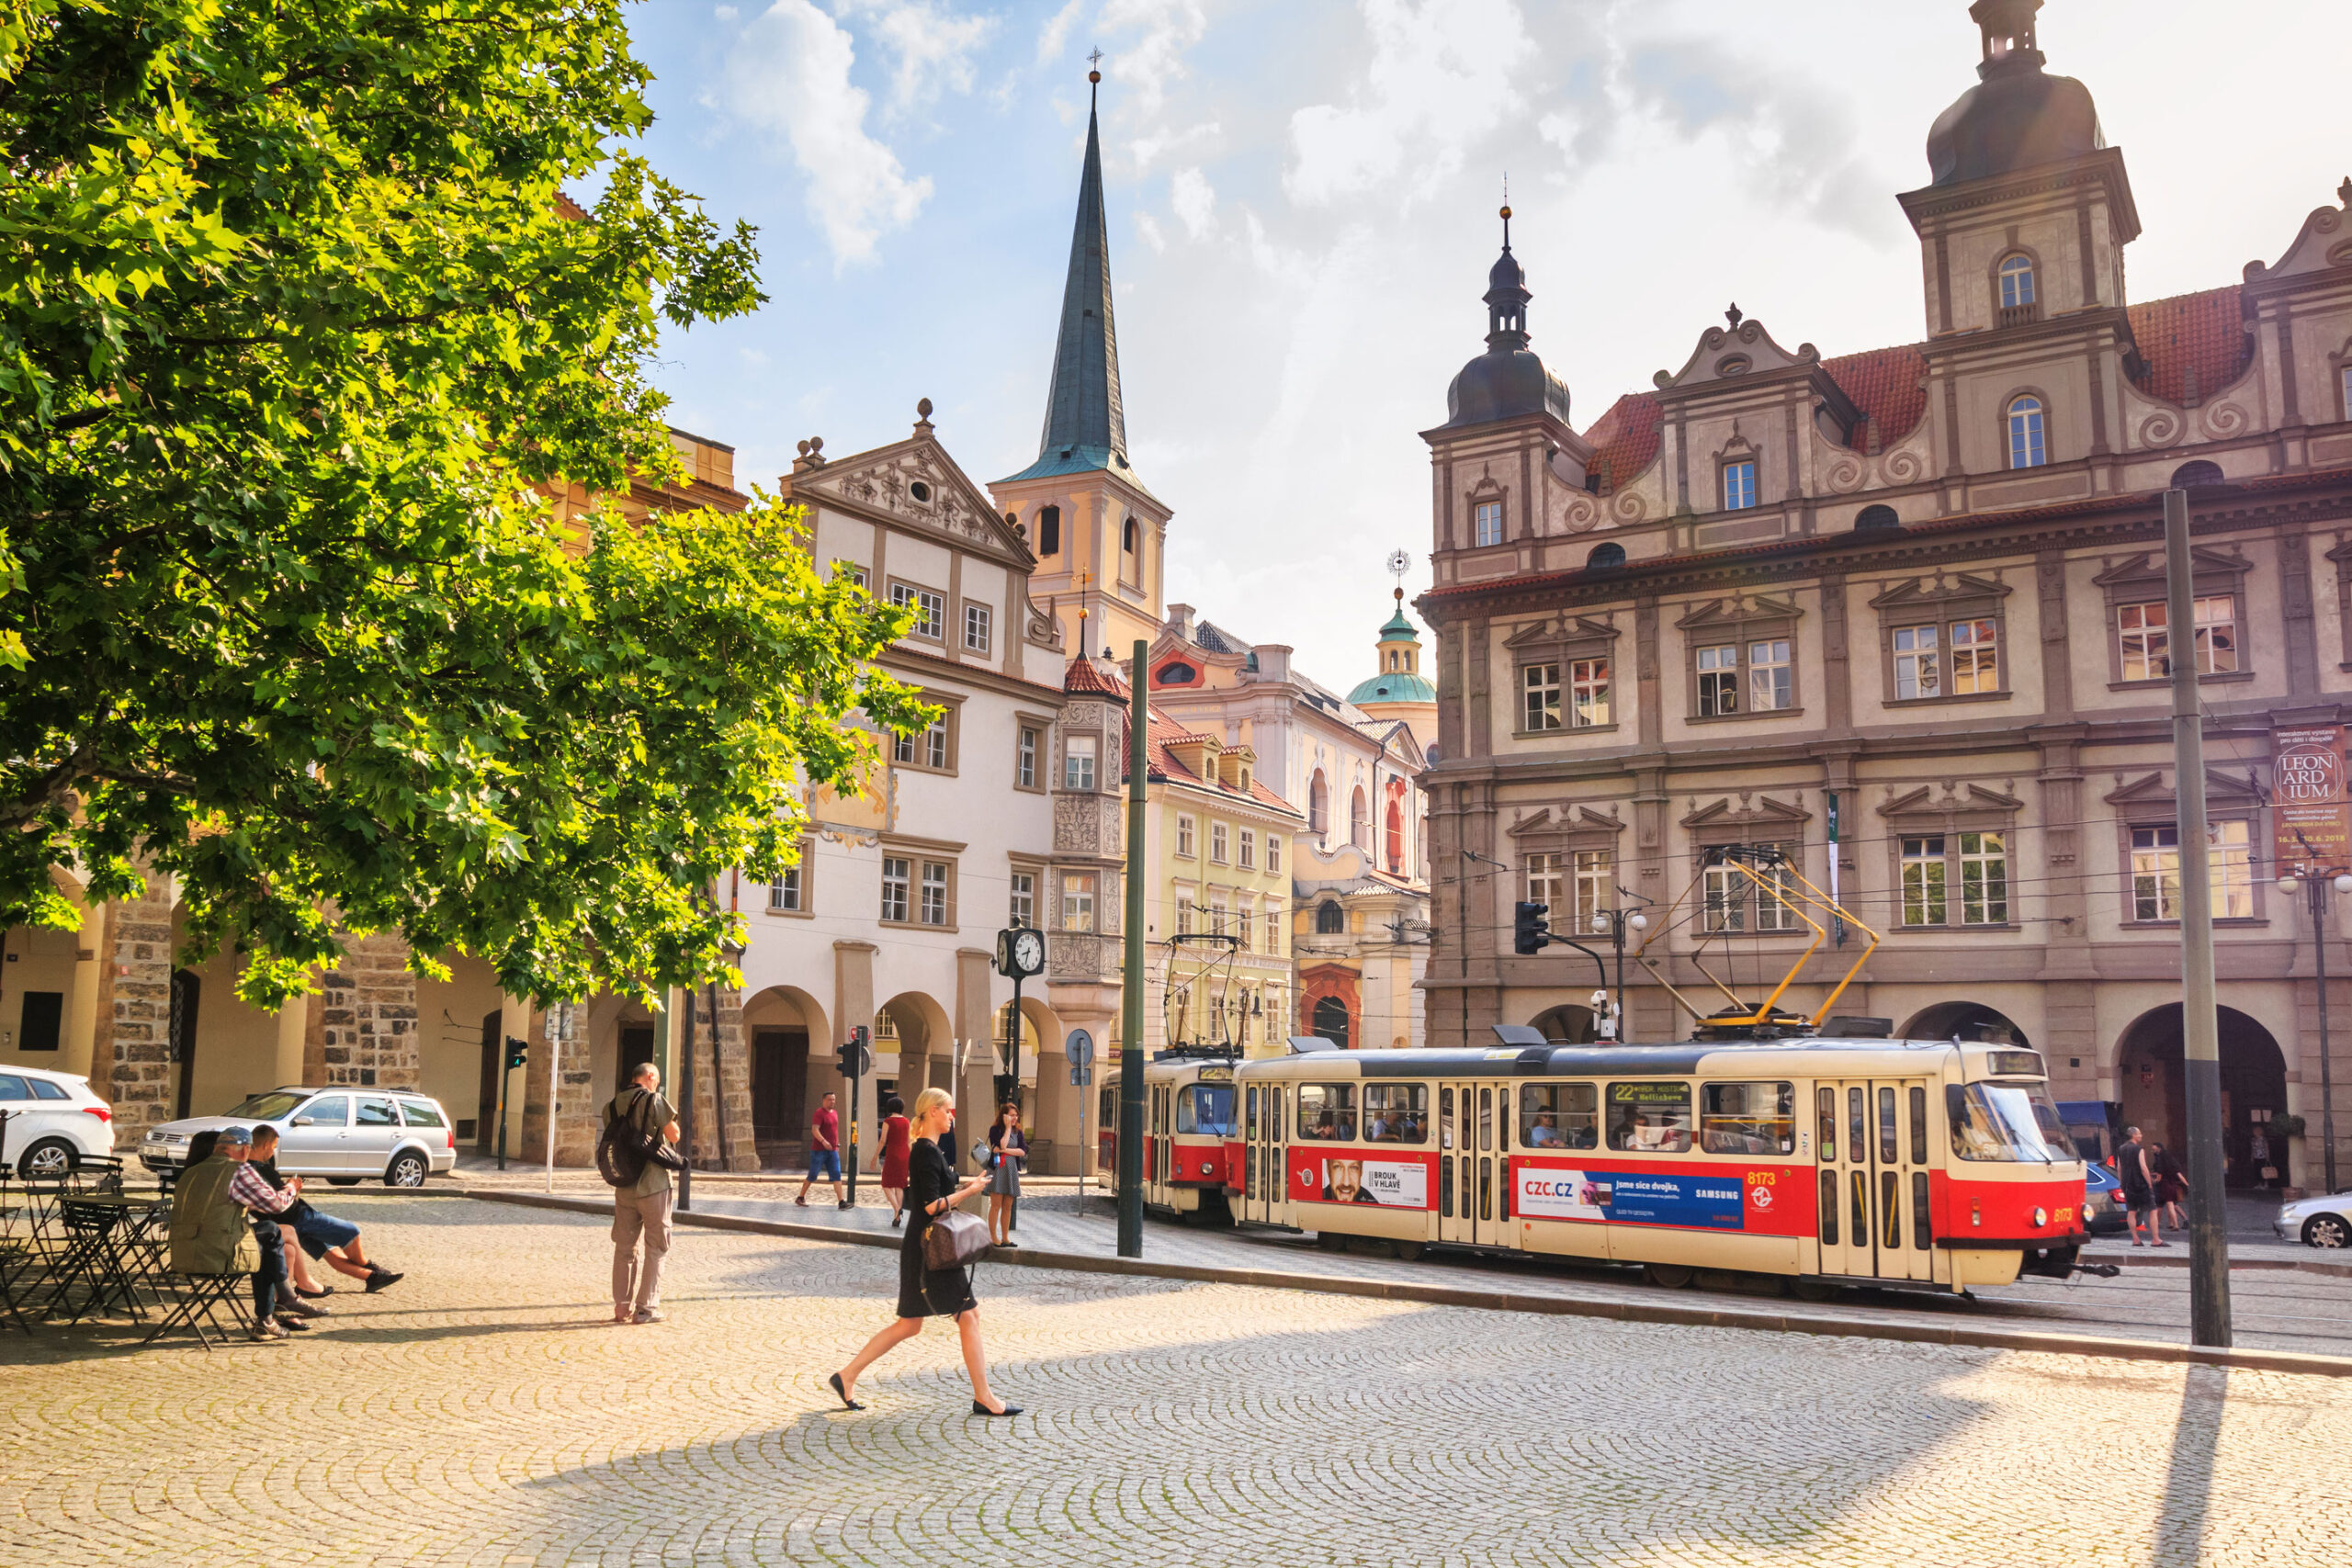 sommer Praha vaer klima temperatur Tsjekkia juni juli august